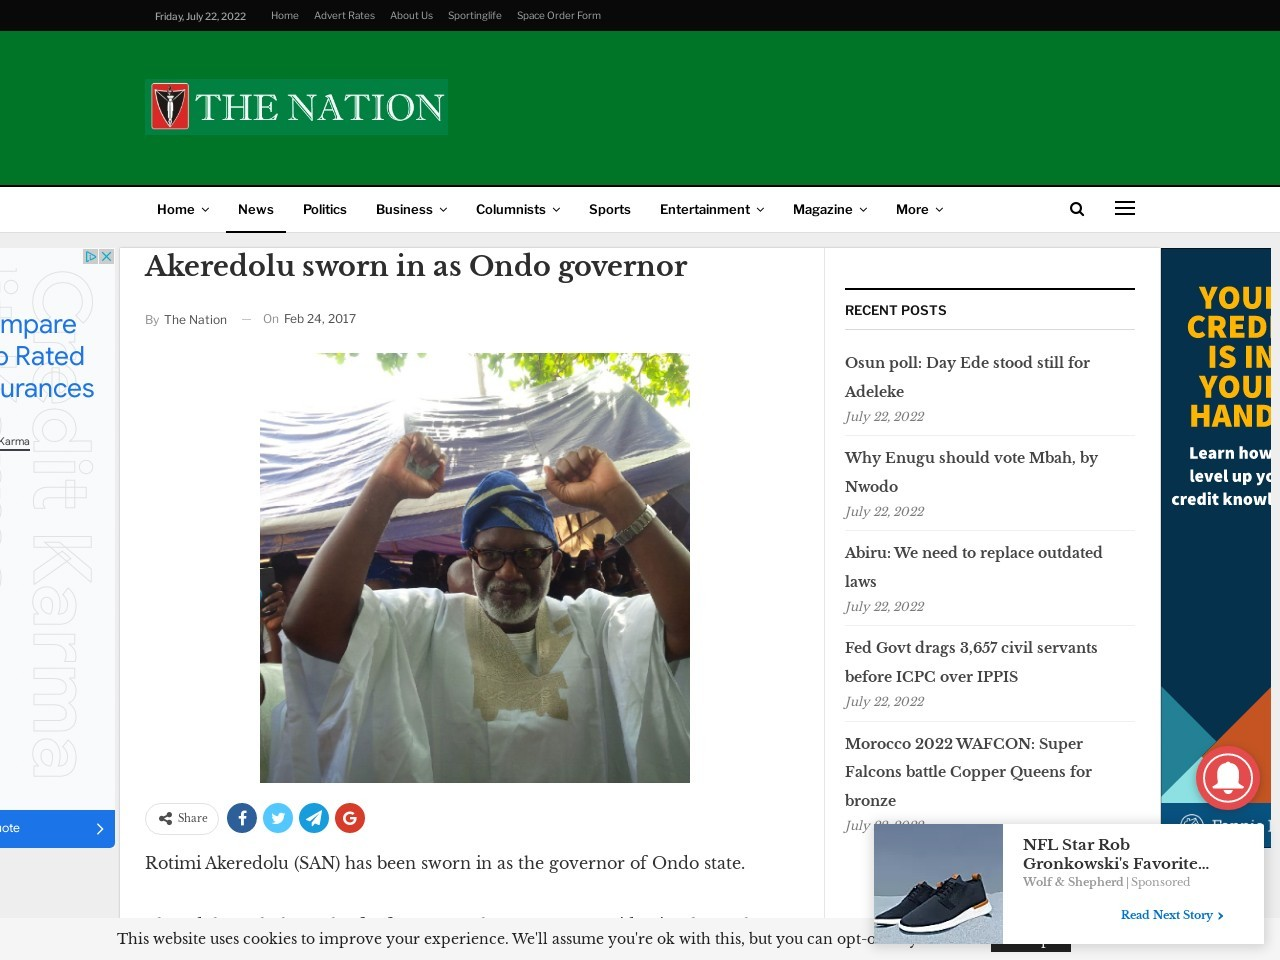 Akeredolu sworn in as Ondo governor